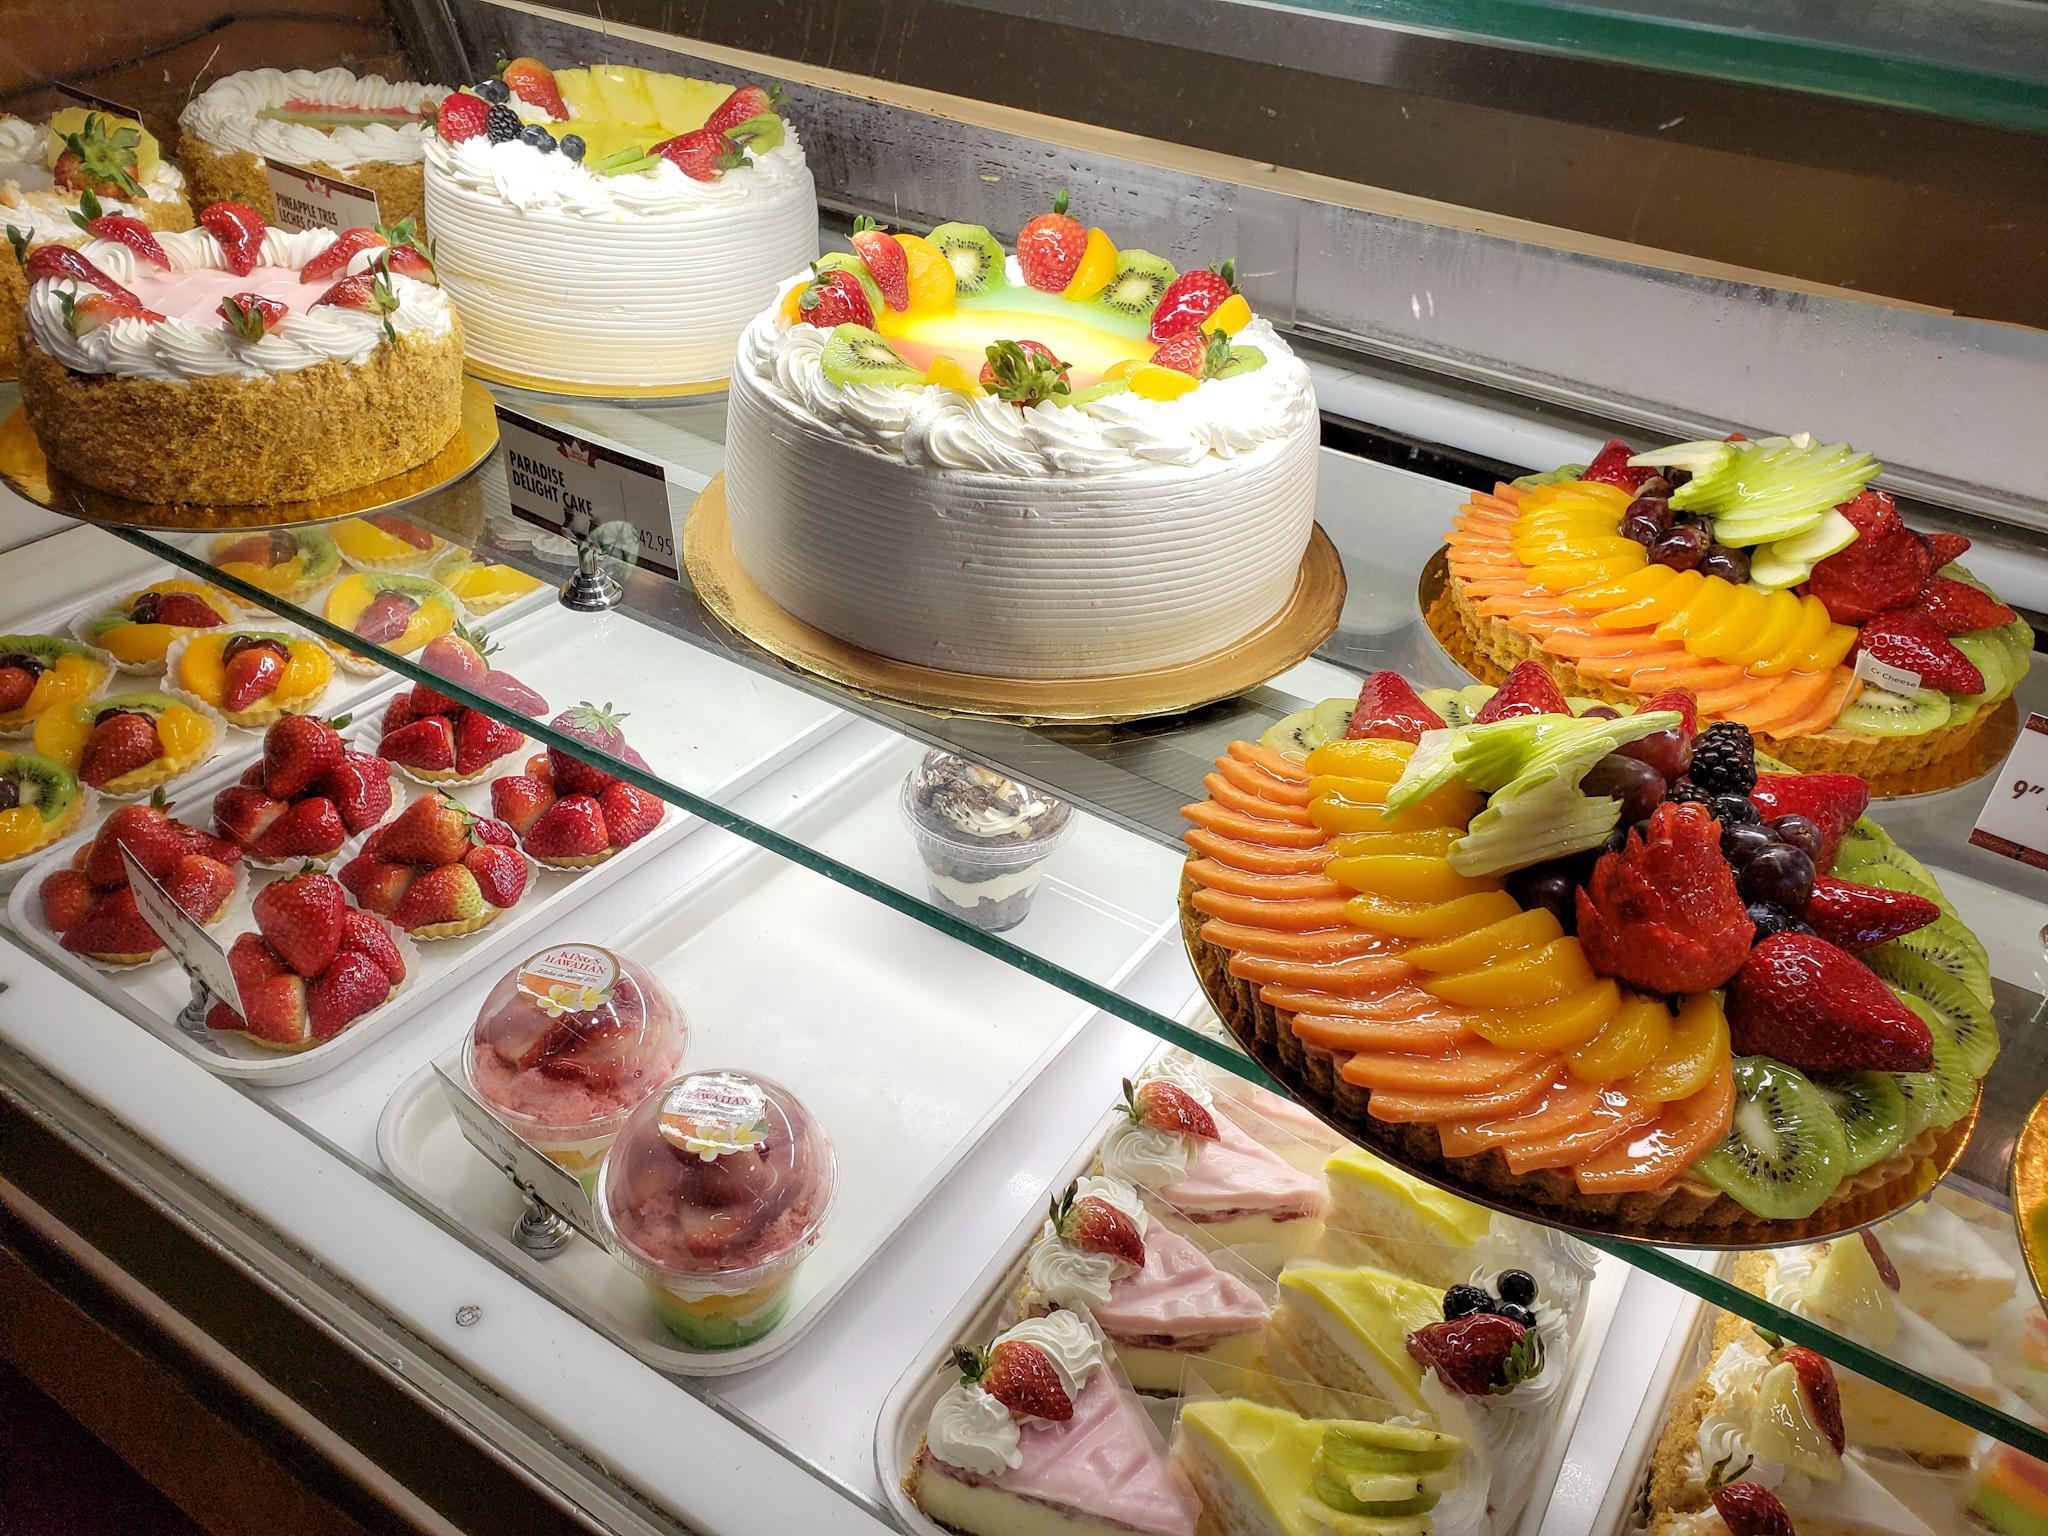 King's Hawaiian Bakery